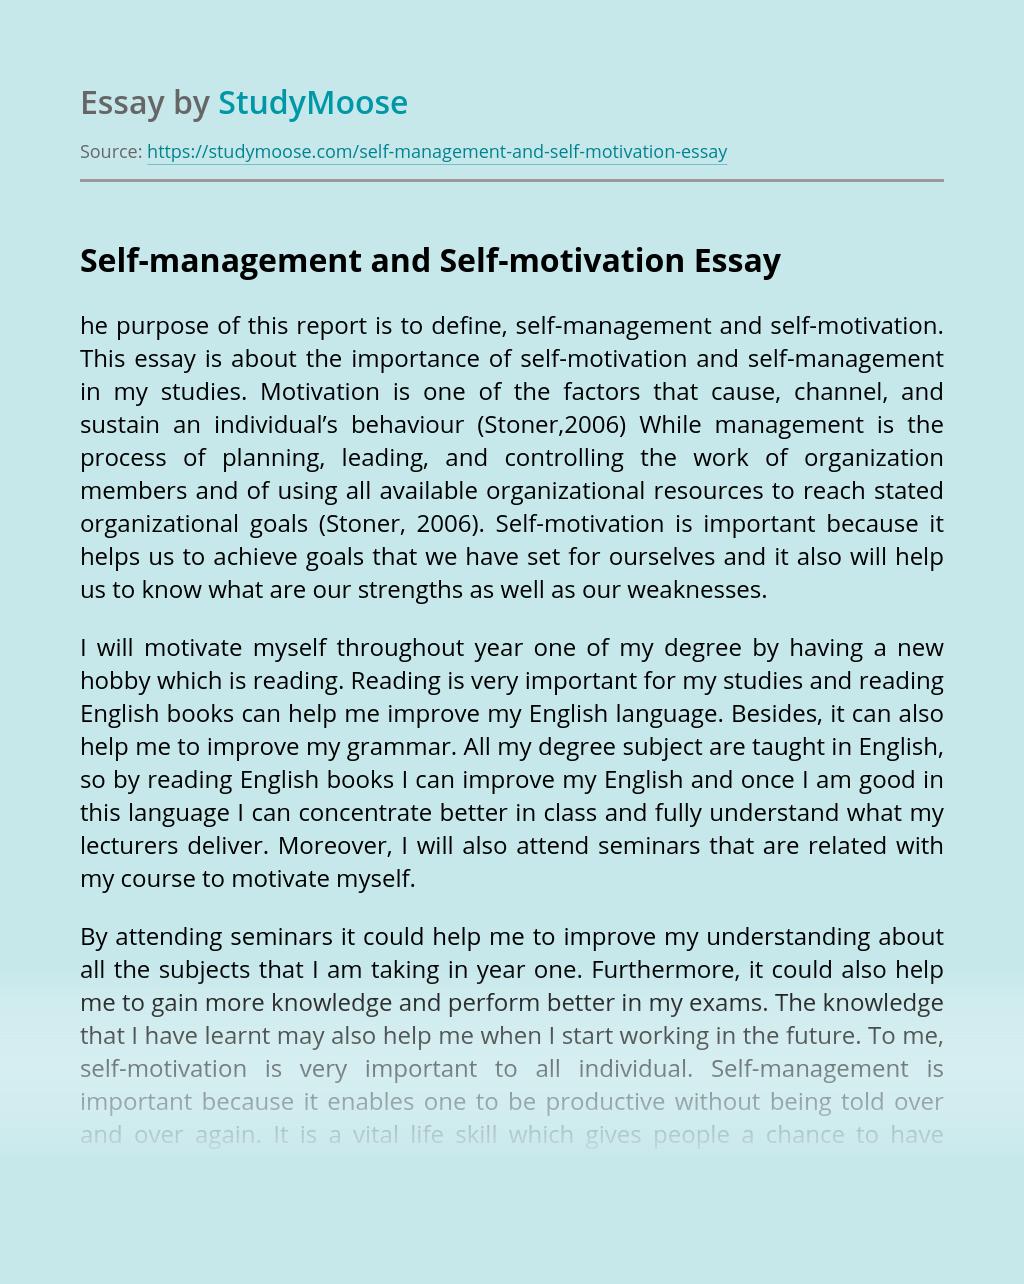 Self-management and Self-motivation